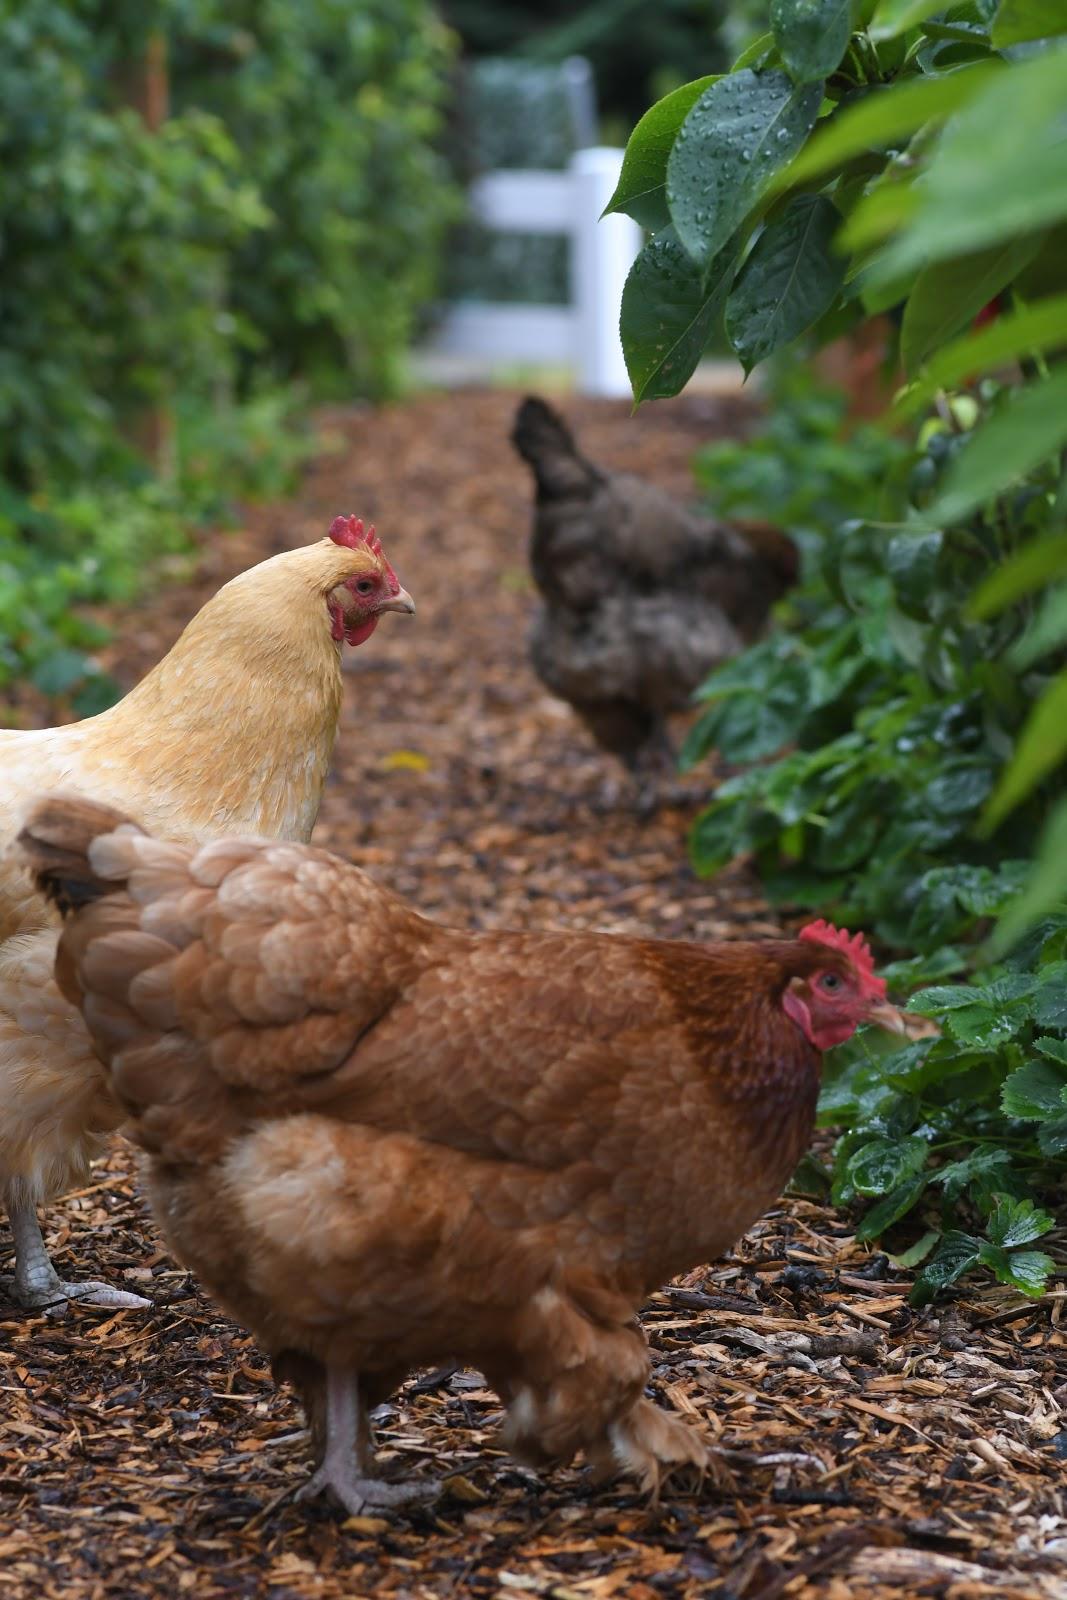 Pbs animal health